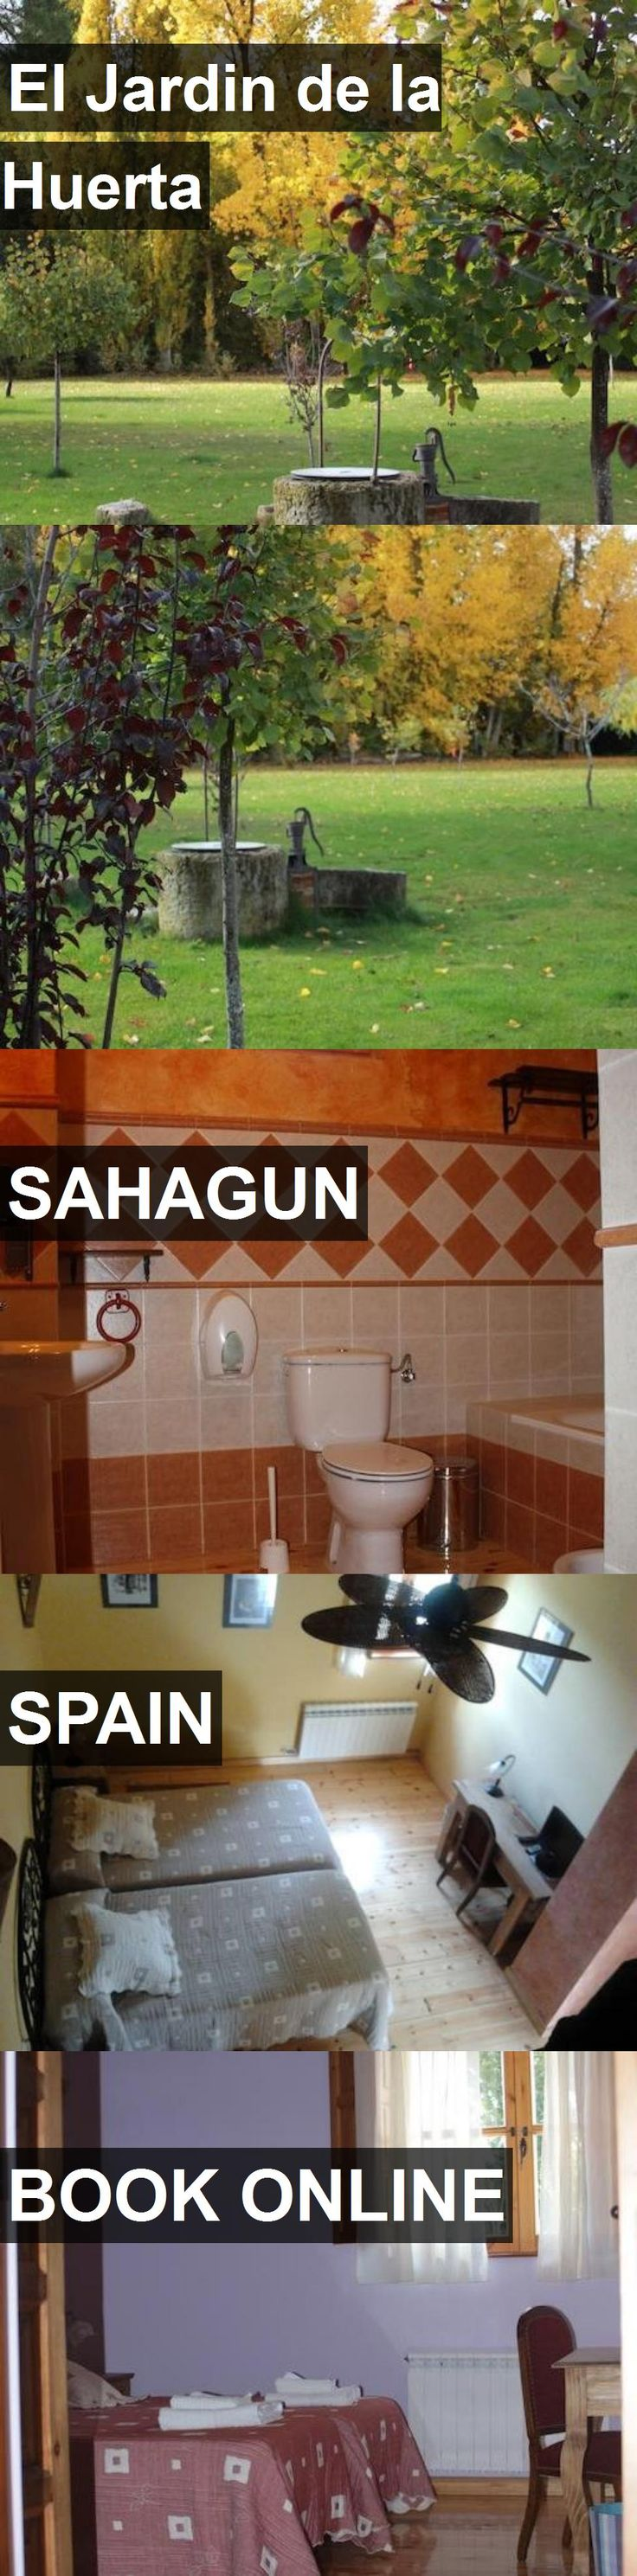 Hotel El Jardin de la Huerta in Sahagun, Spain. For more information, photos, reviews and best prices please follow the link. #Spain #Sahagun #ElJardindelaHuerta #hotel #travel #vacation